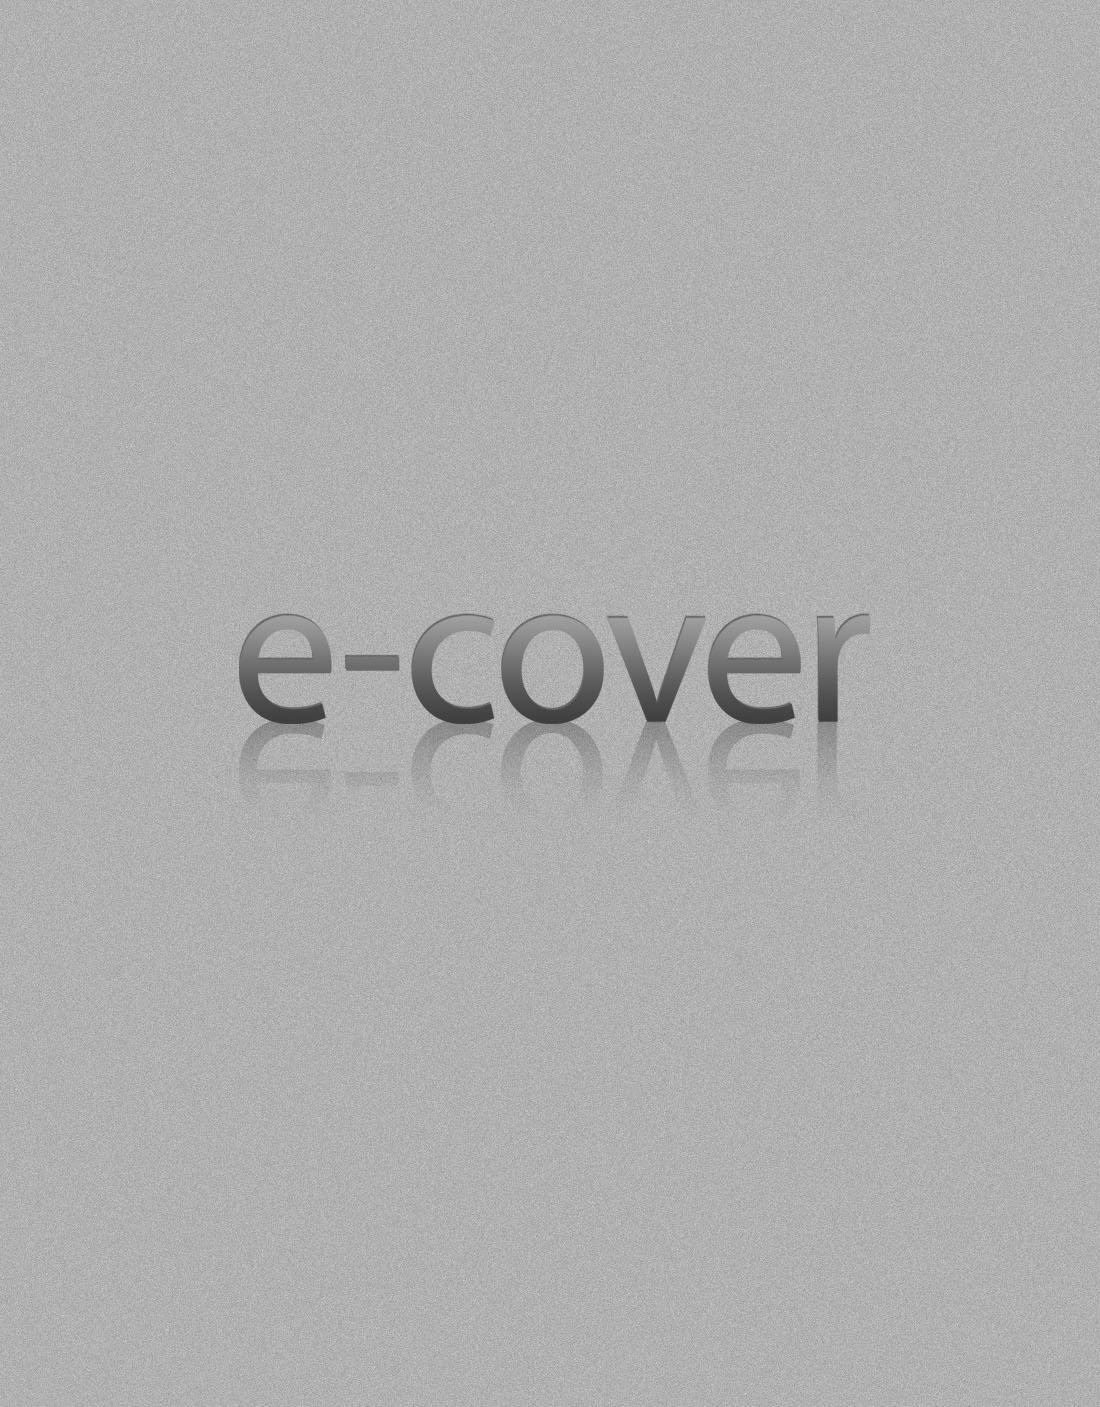 Logotipo Ecover